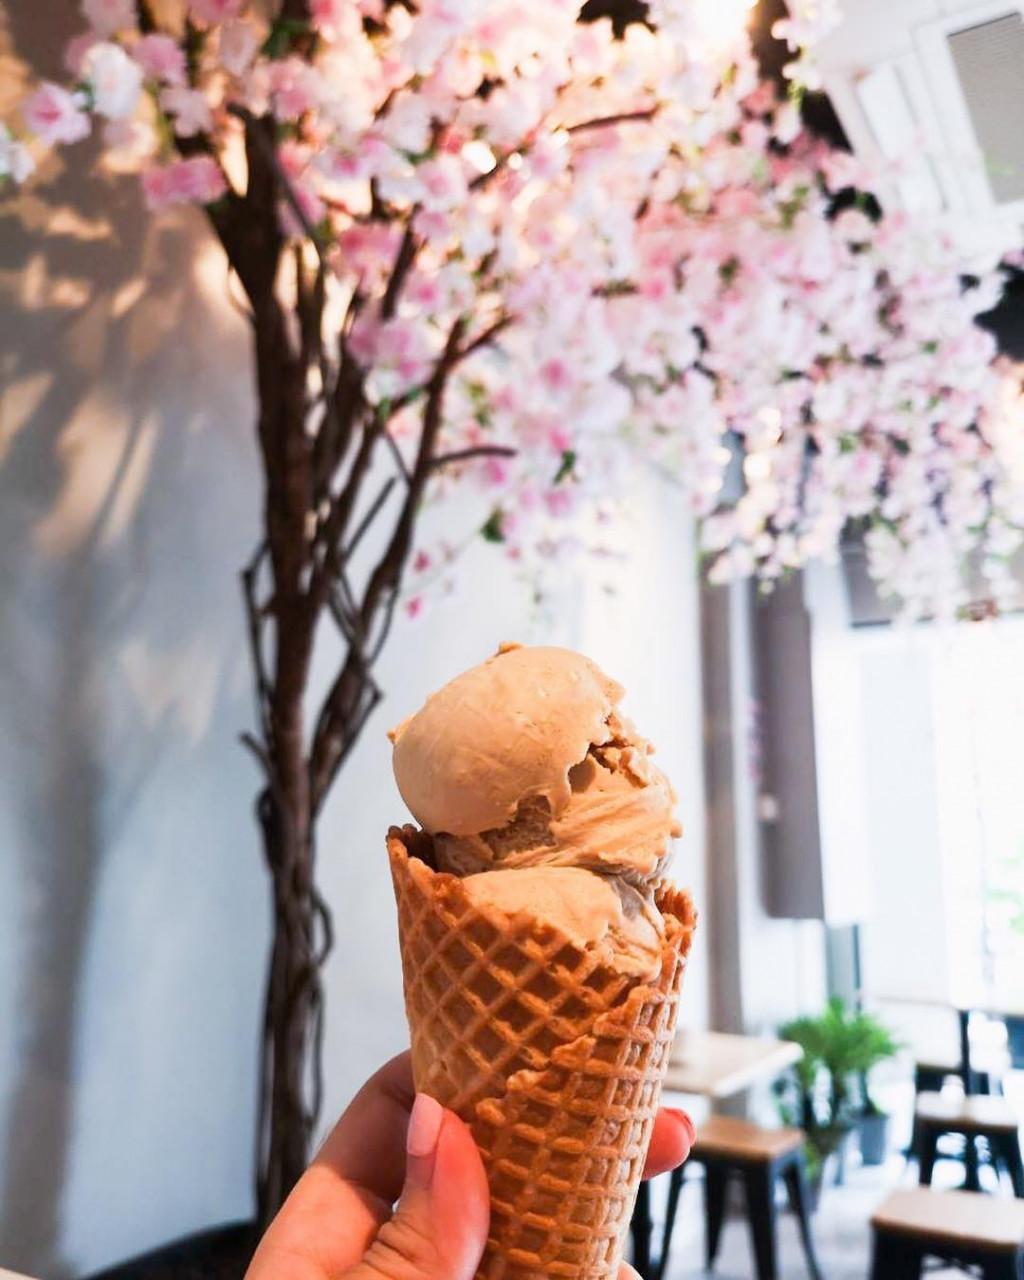 Wishes Cafe - ice cream